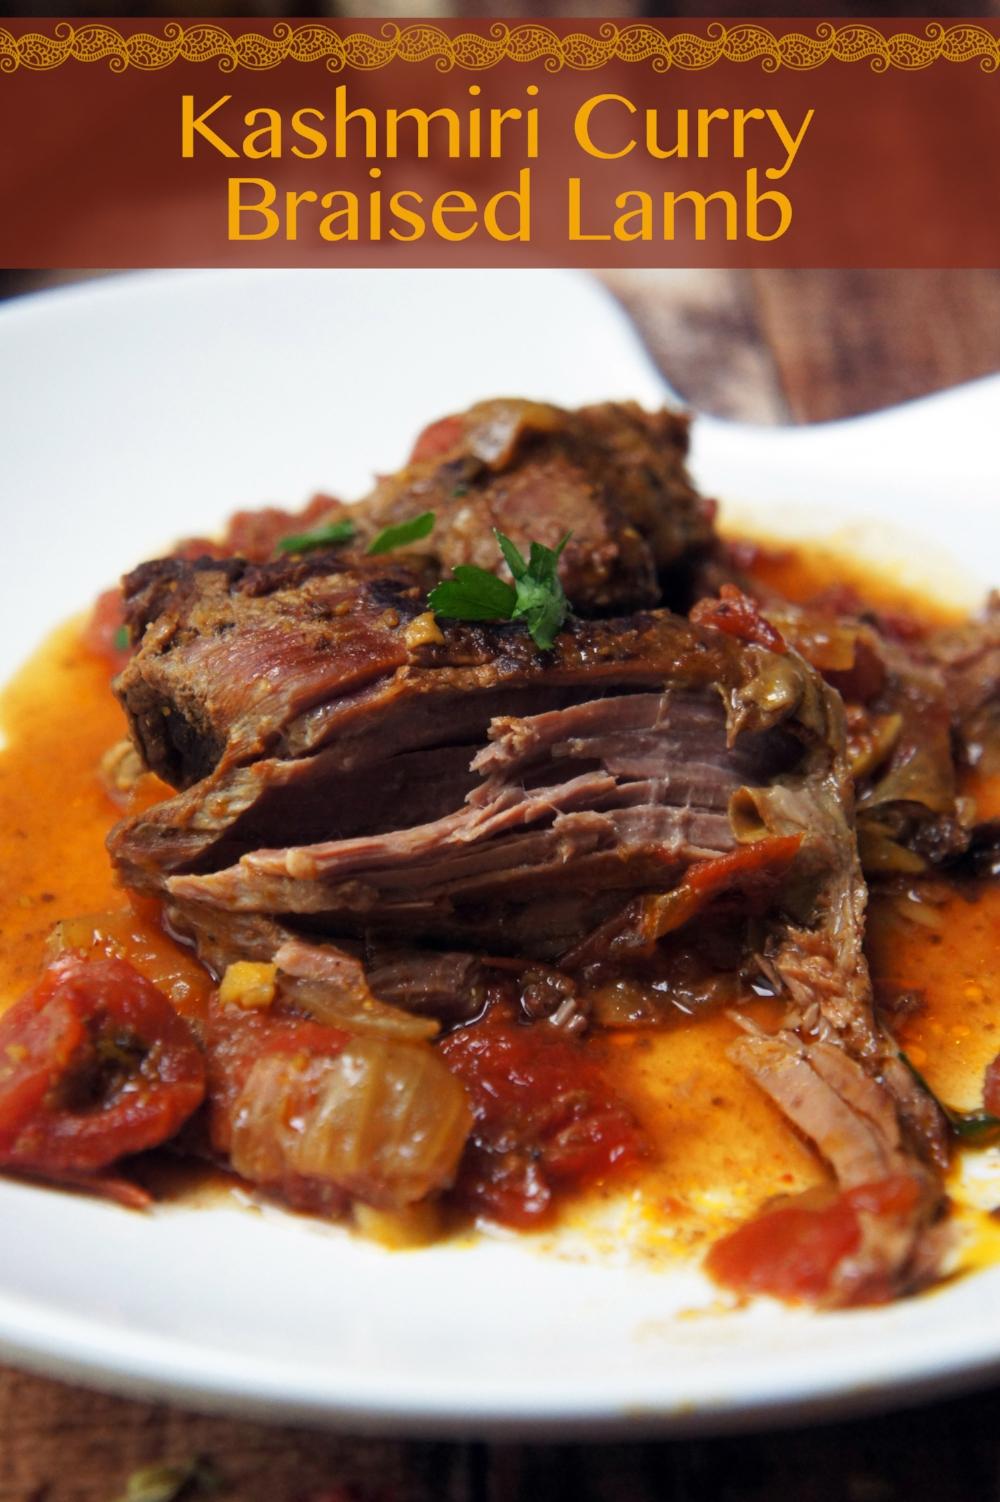 Kashmiri Curry Braised Leg of Lamb — Foraged Dish